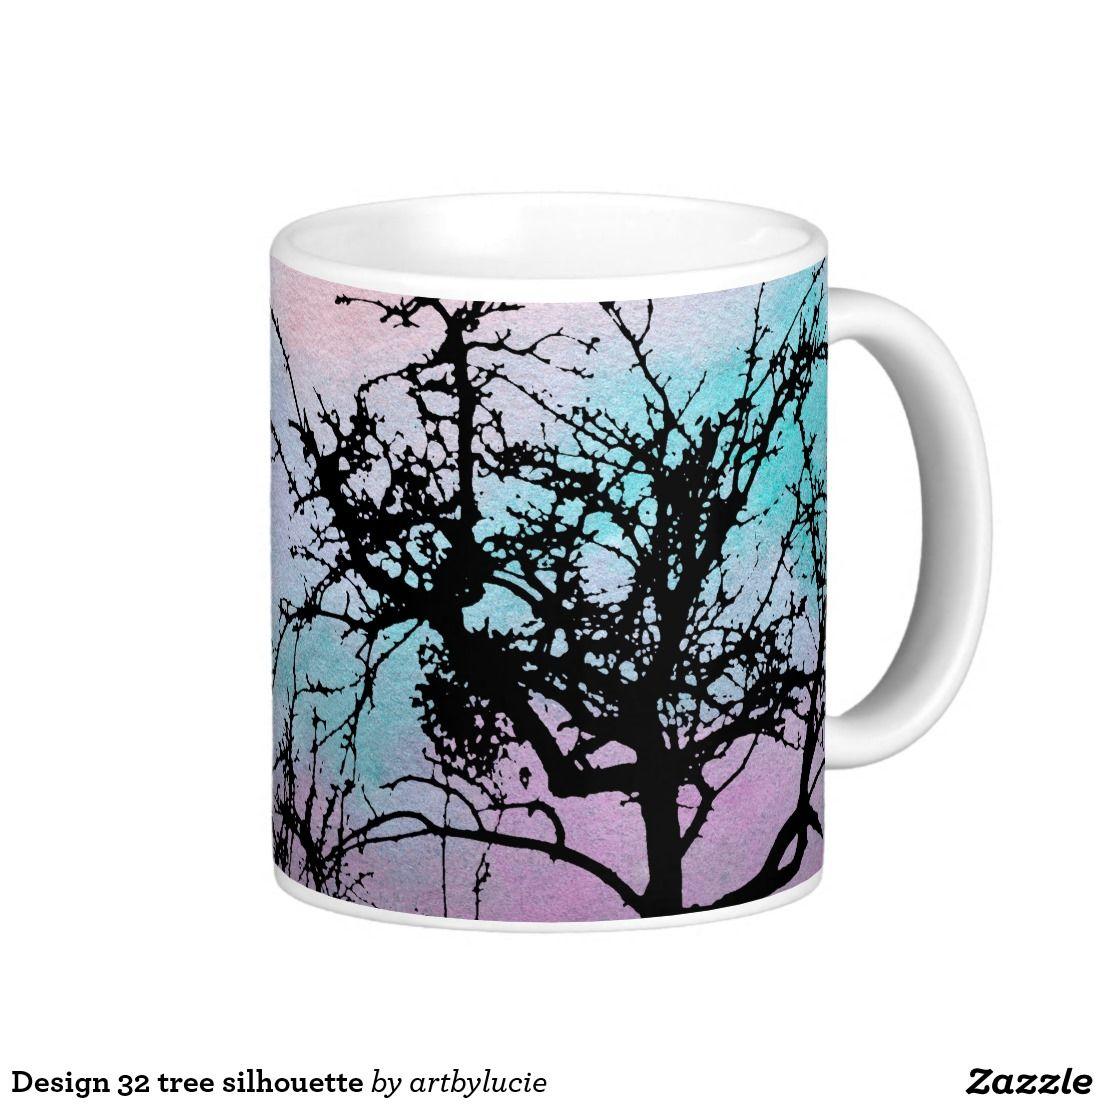 Design 32 tree silhouette classic white coffee mug Mugs